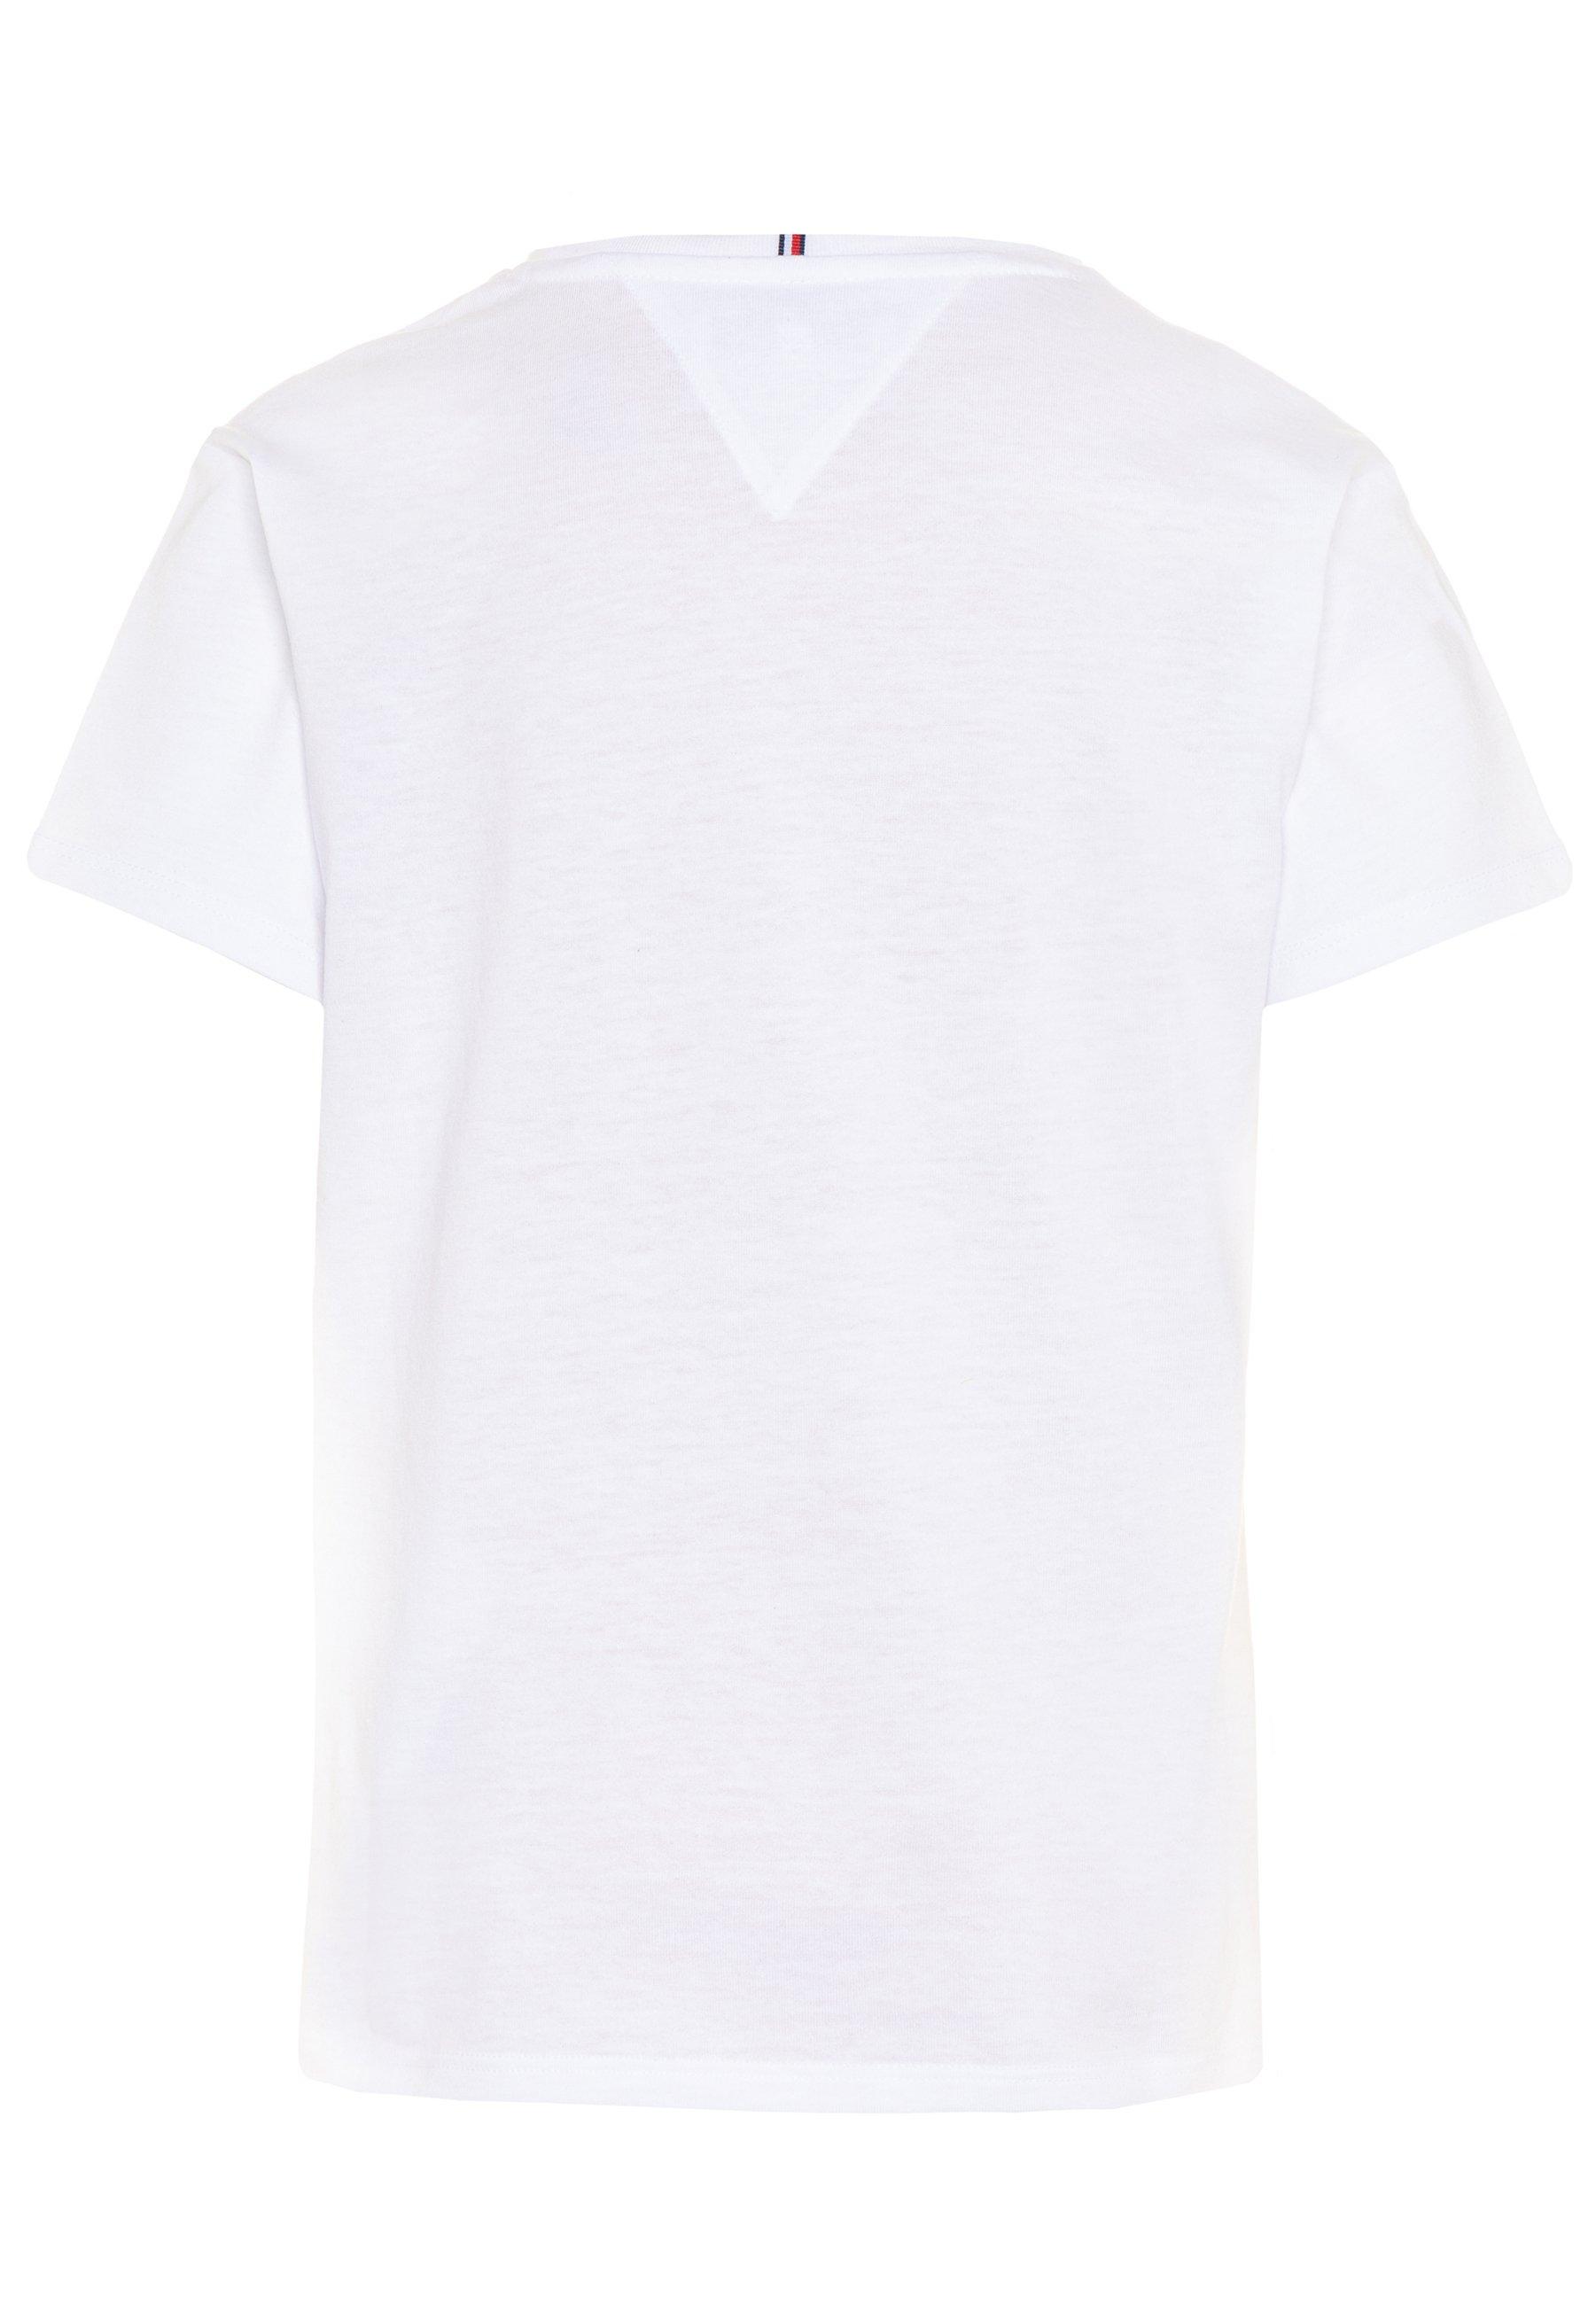 FLAG TAPE TEE T shirt imprimé white